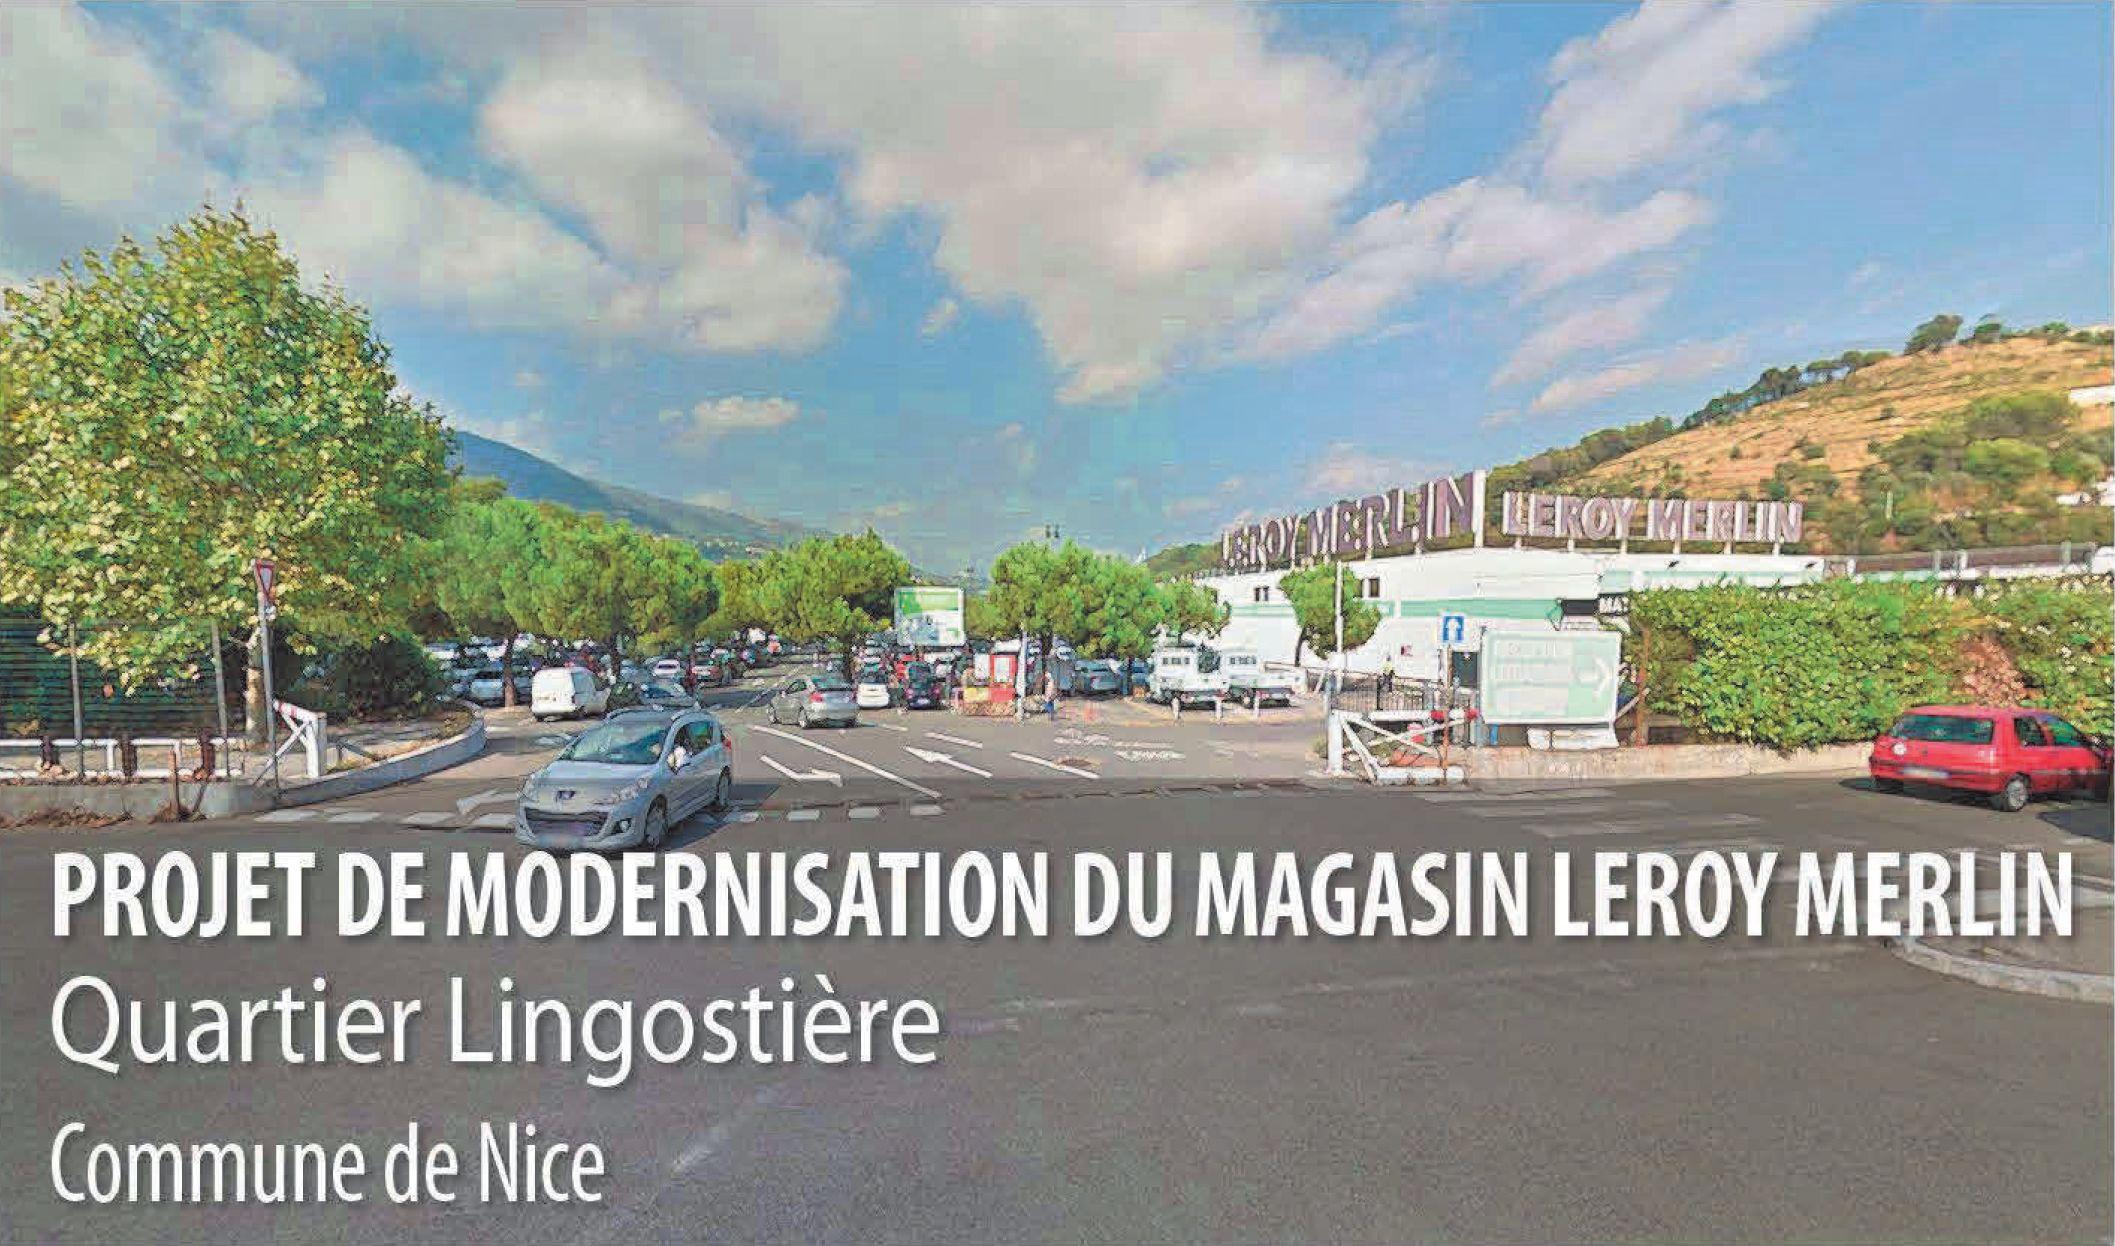 Leroy Merlin -projet de modernisation -Quartier Lingostière, Nice, Alpes-Maritimes 06